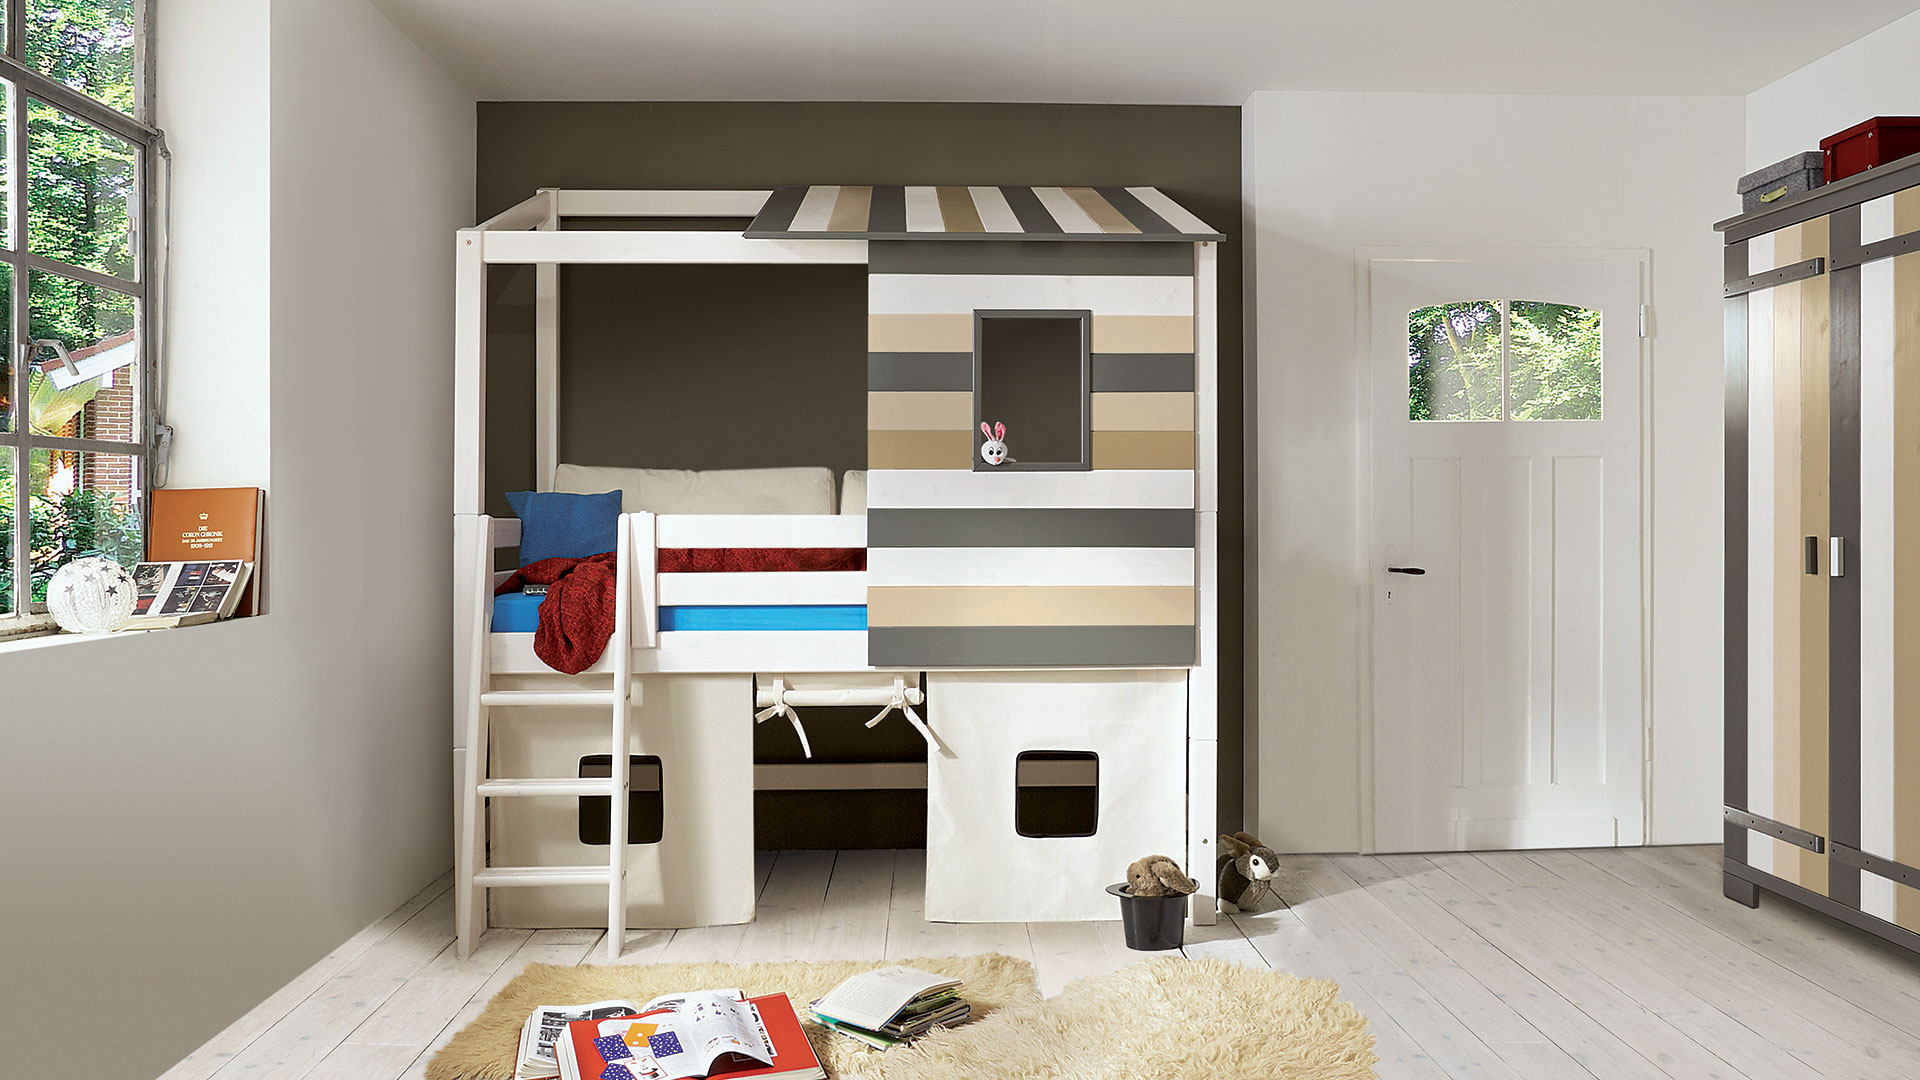 abenteuer hochbett colori. Black Bedroom Furniture Sets. Home Design Ideas